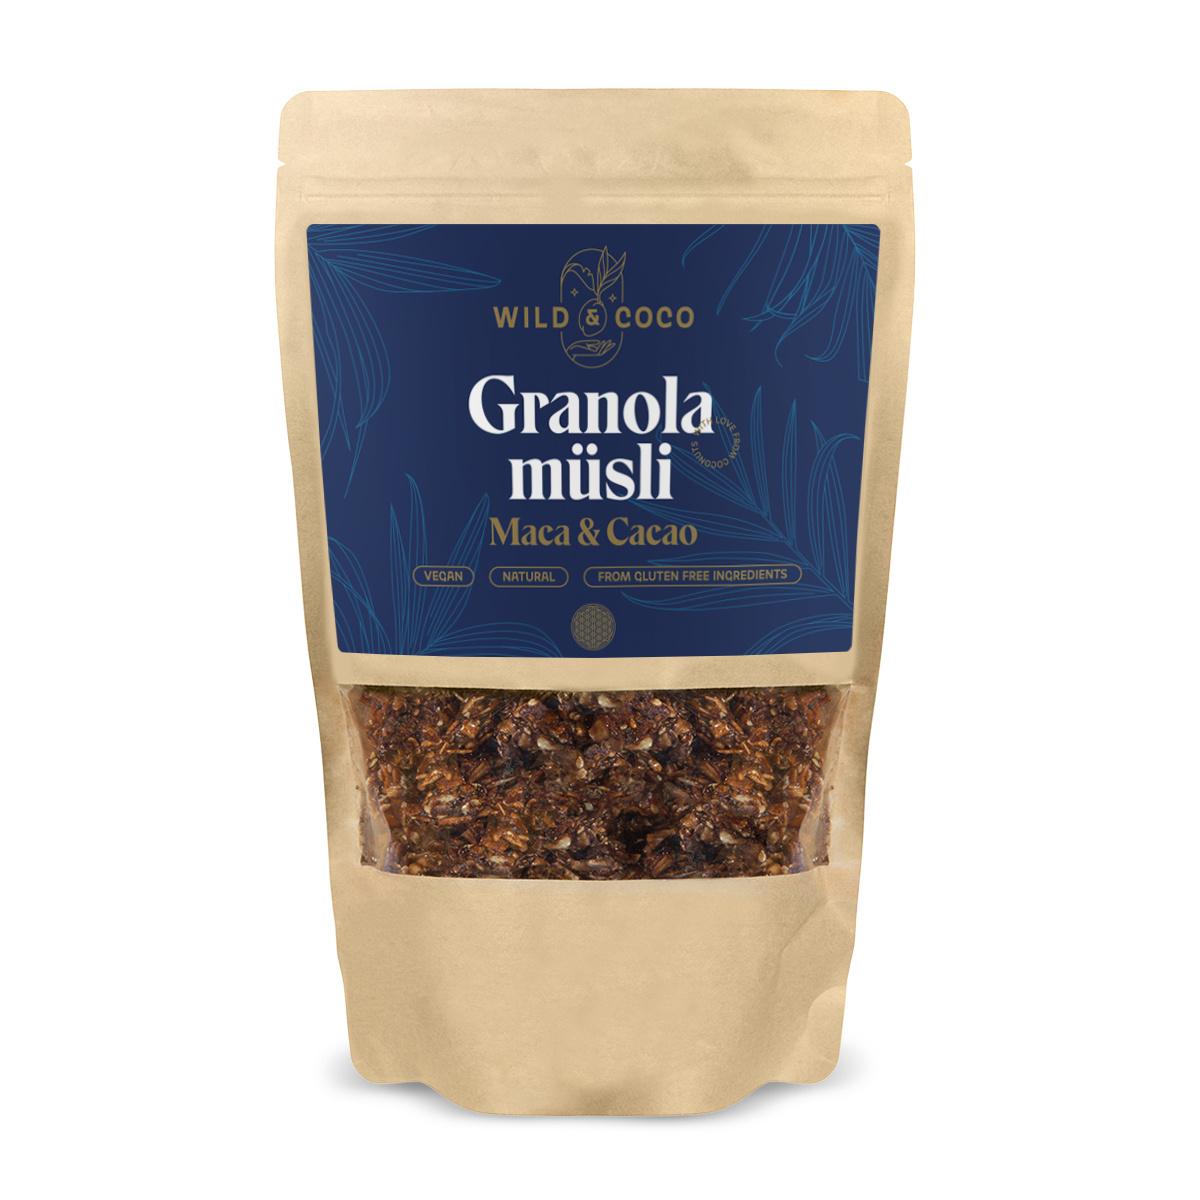 Wild&Coco - Granola Maca & Cacao, 250 g